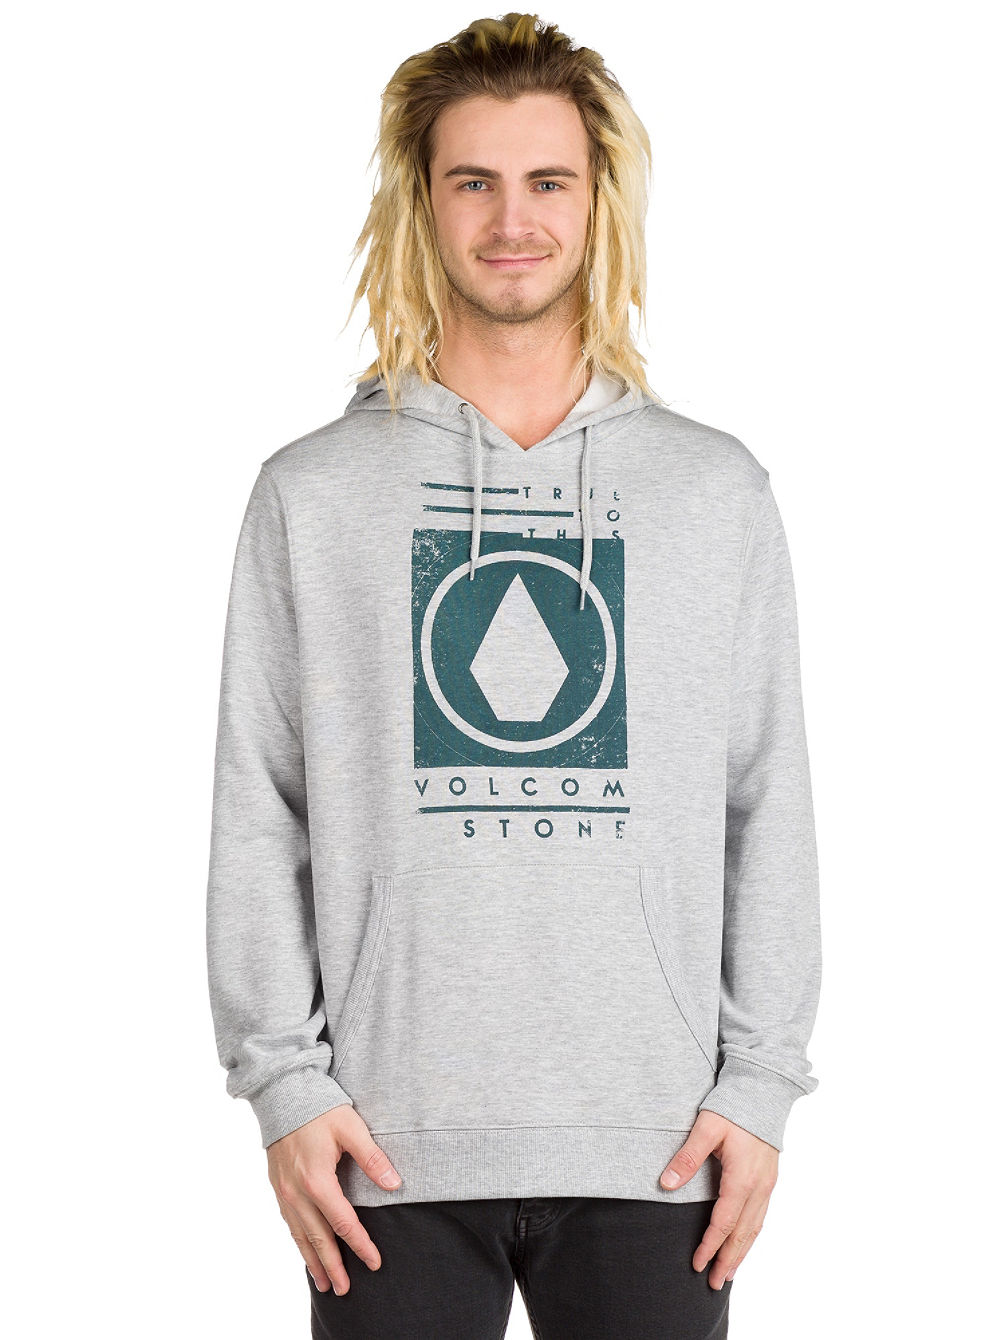 volcom-stone-stamp-po-fleece-hoodie